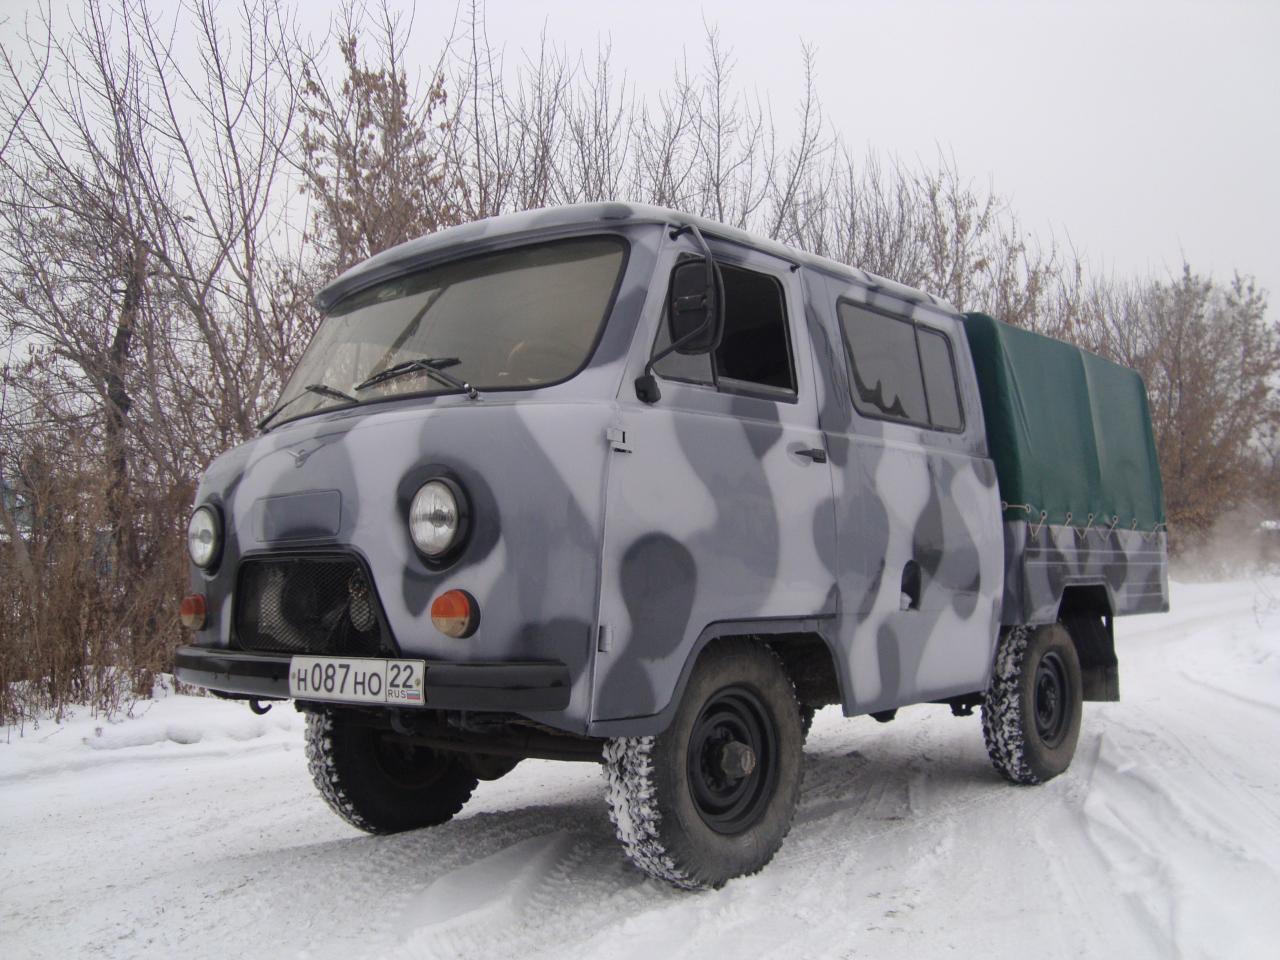 Продам автомобиль УАЗ 2206 1995 г.в., г.Барнаул, 200000 р ...: http://avto-pk.ru/advert-2639/